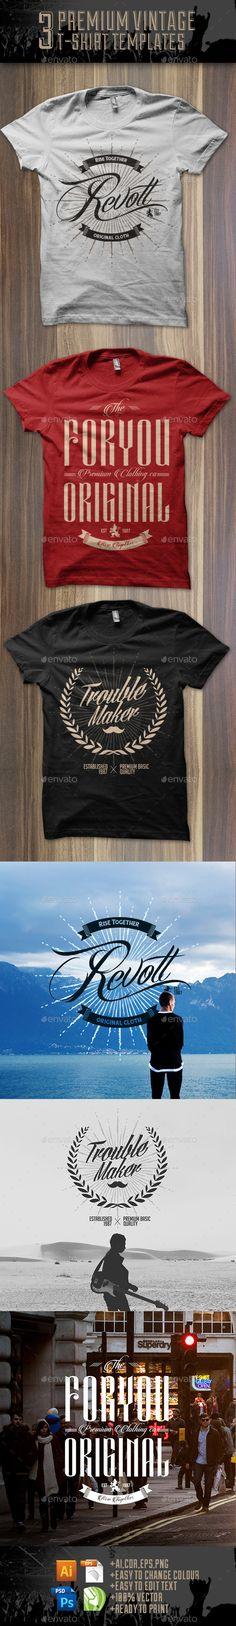 3 Premium T-Shirt Template  #editable #premium #retro • Available here → http://graphicriver.net/item/3-premium-tshirt-template/8956143?s_rank=10&ref=pxcr